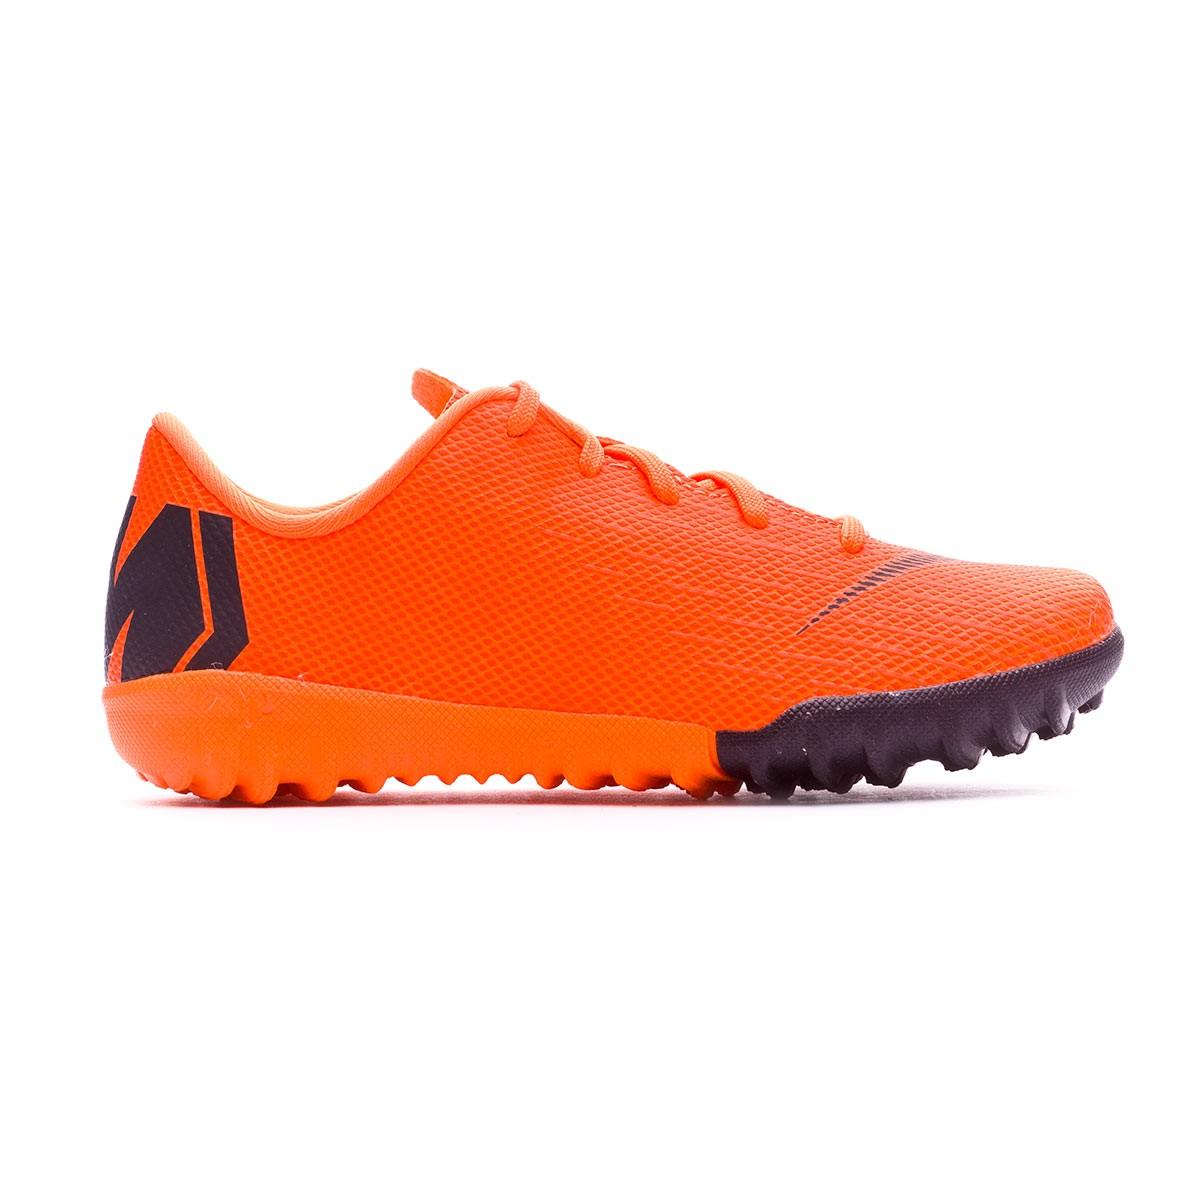 ba1b7480882b Football Boot Nike Kids Mercurial VaporX XII Academy PS Turf Total orange- Black-Volt - Soloporteros es ahora Fútbol Emotion